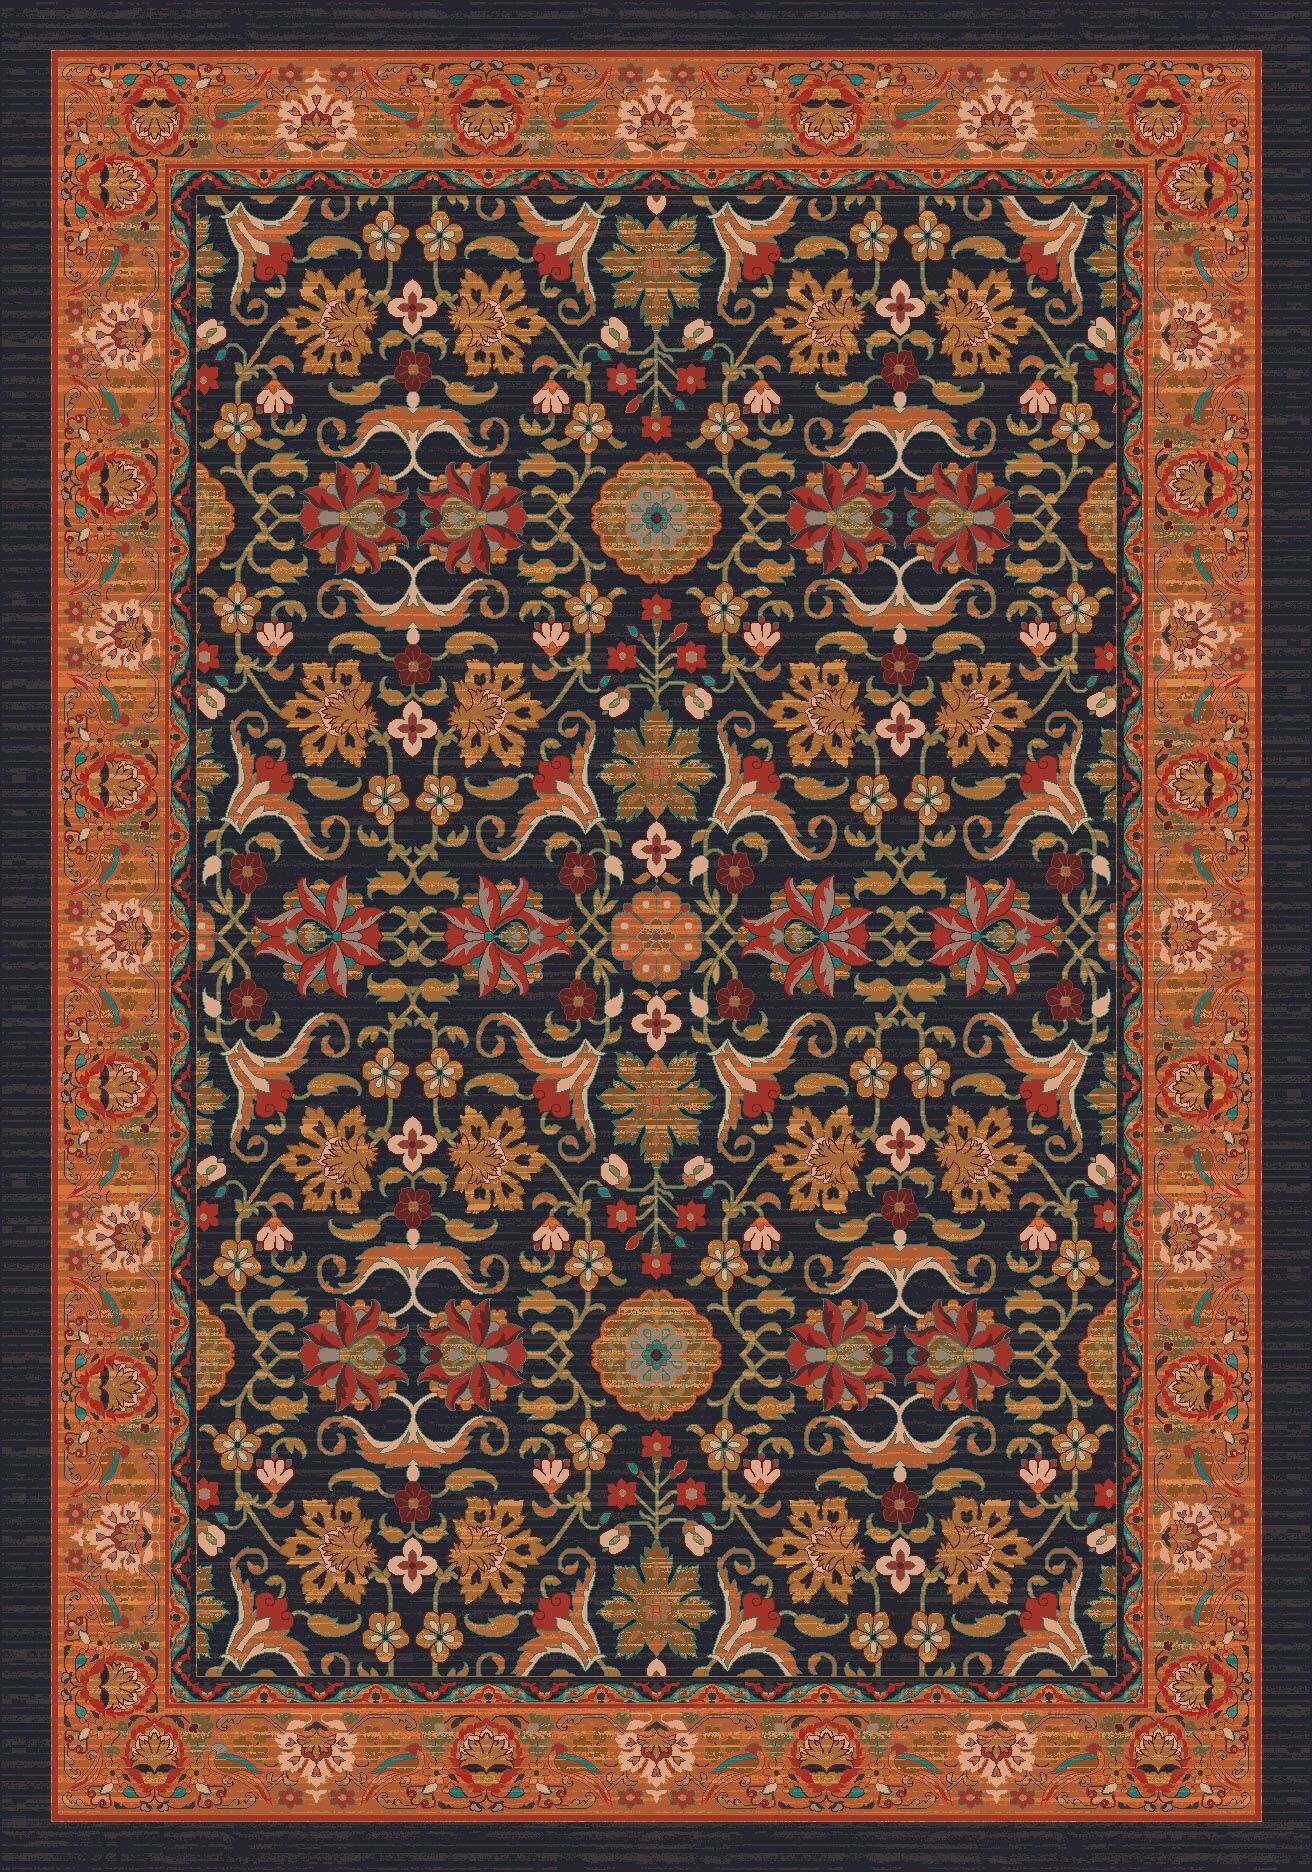 Pastiche Kamil Ebony Folk/Tribal Rug Rug Size: Rectangle 5'4